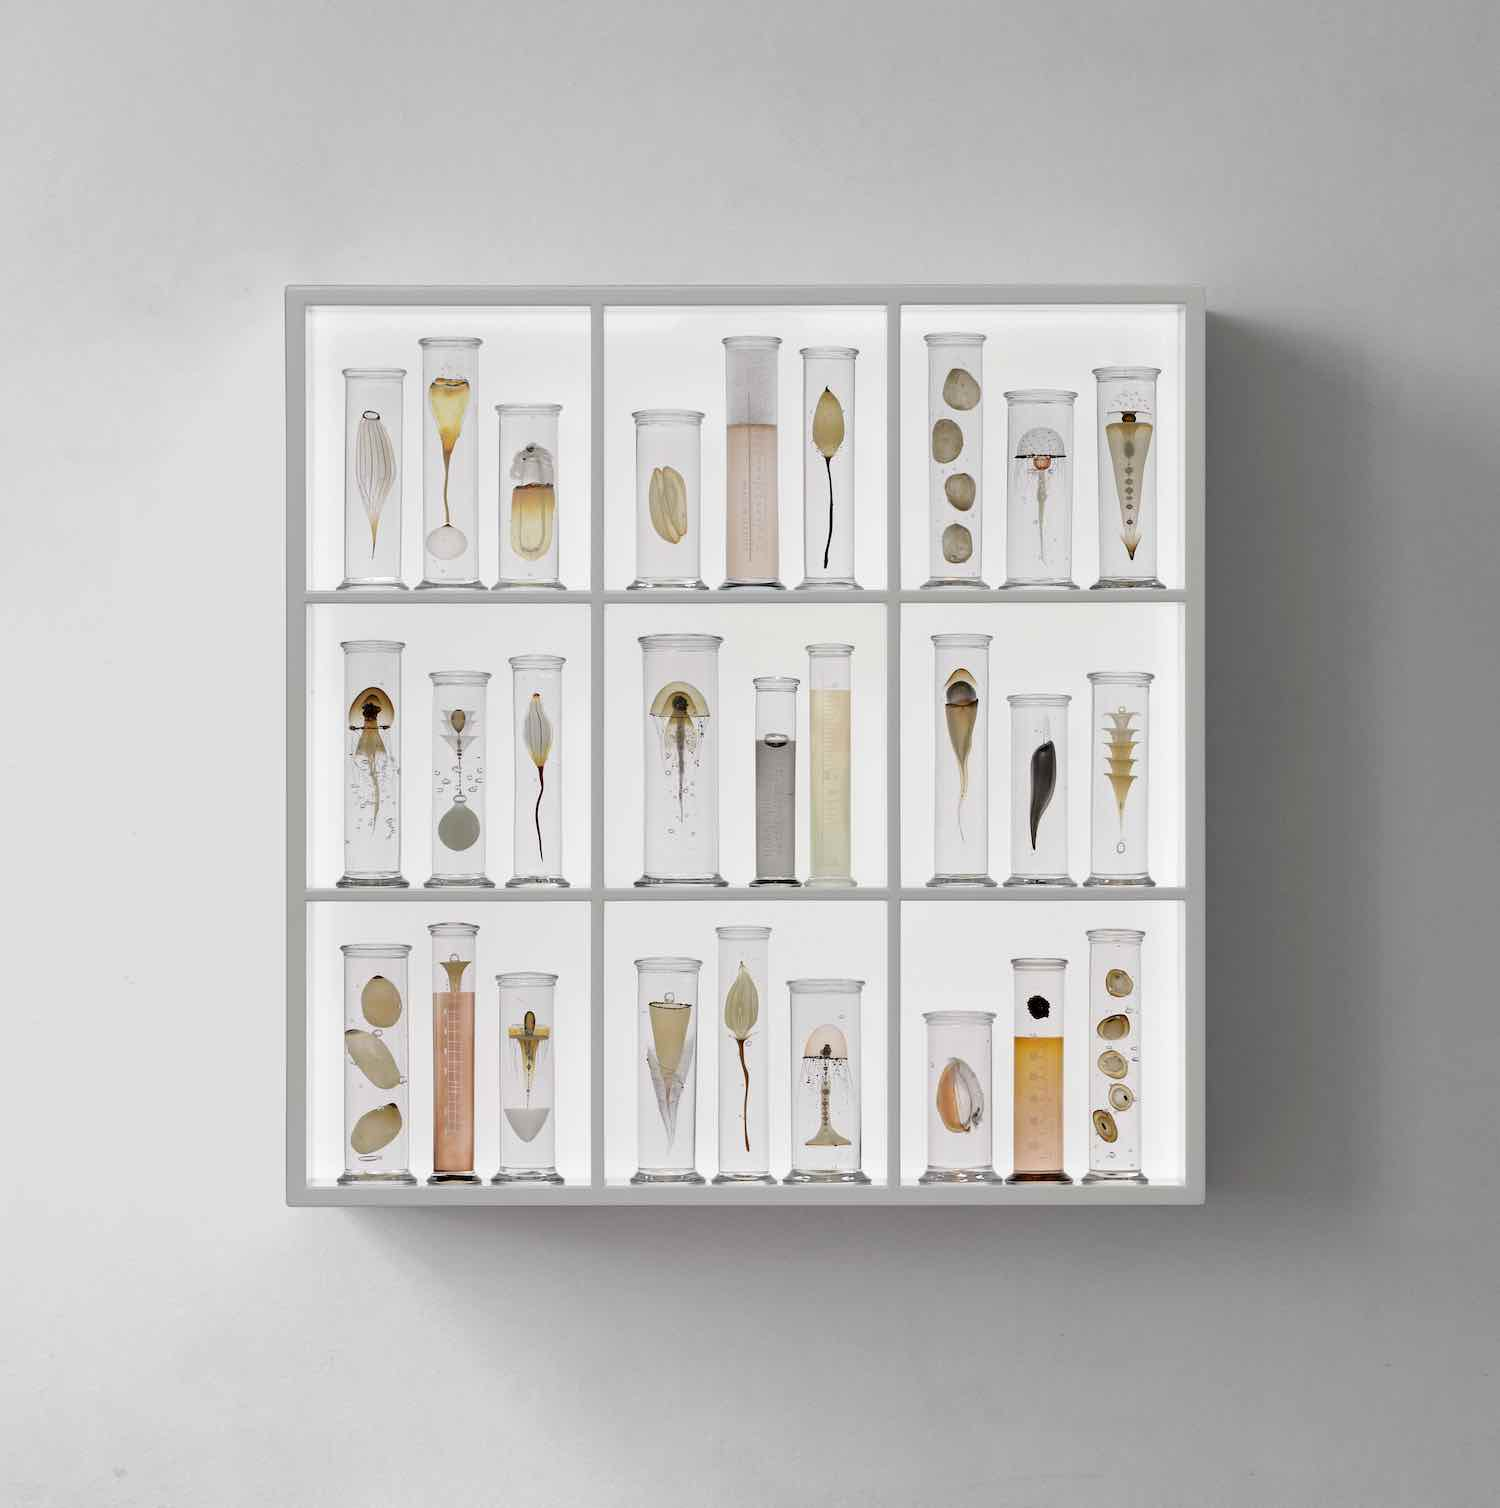 Steffen Damm's Cabinet for Collect 2020 - Courtesy of Joanna Bird.